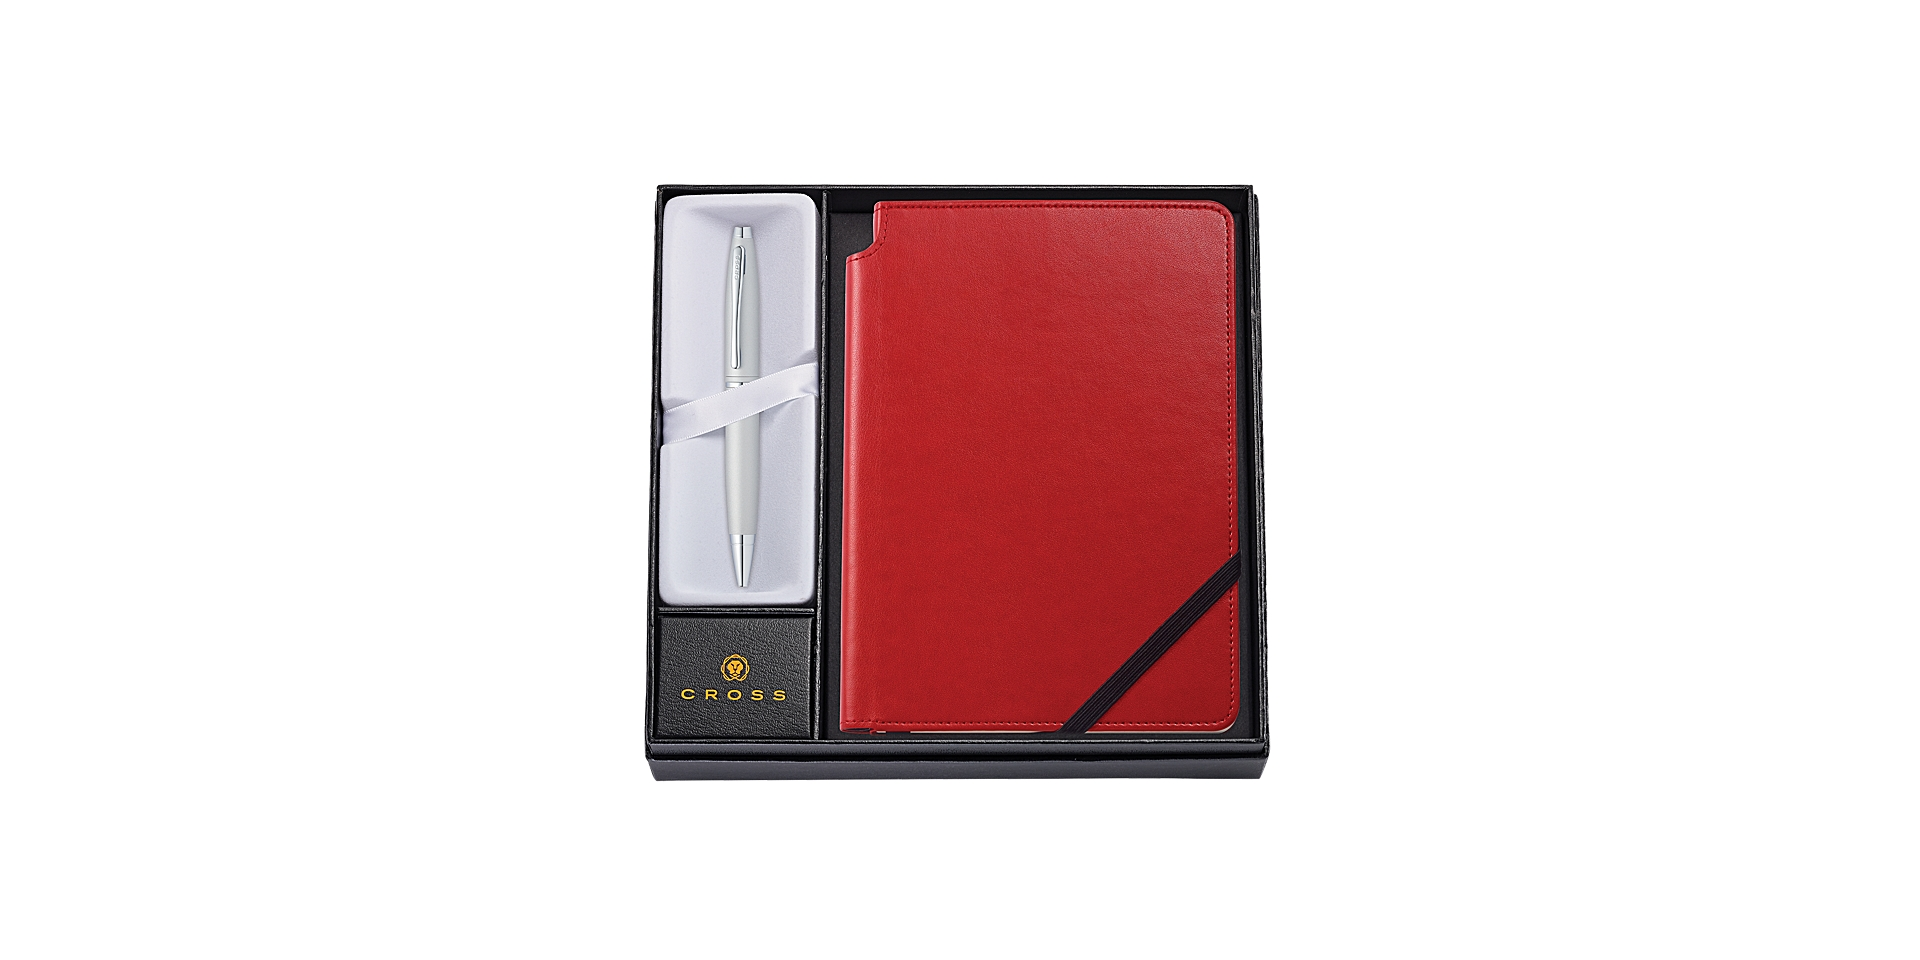 Calais Satin Chrome Ballpoint Pen with Medium Crimson Journal